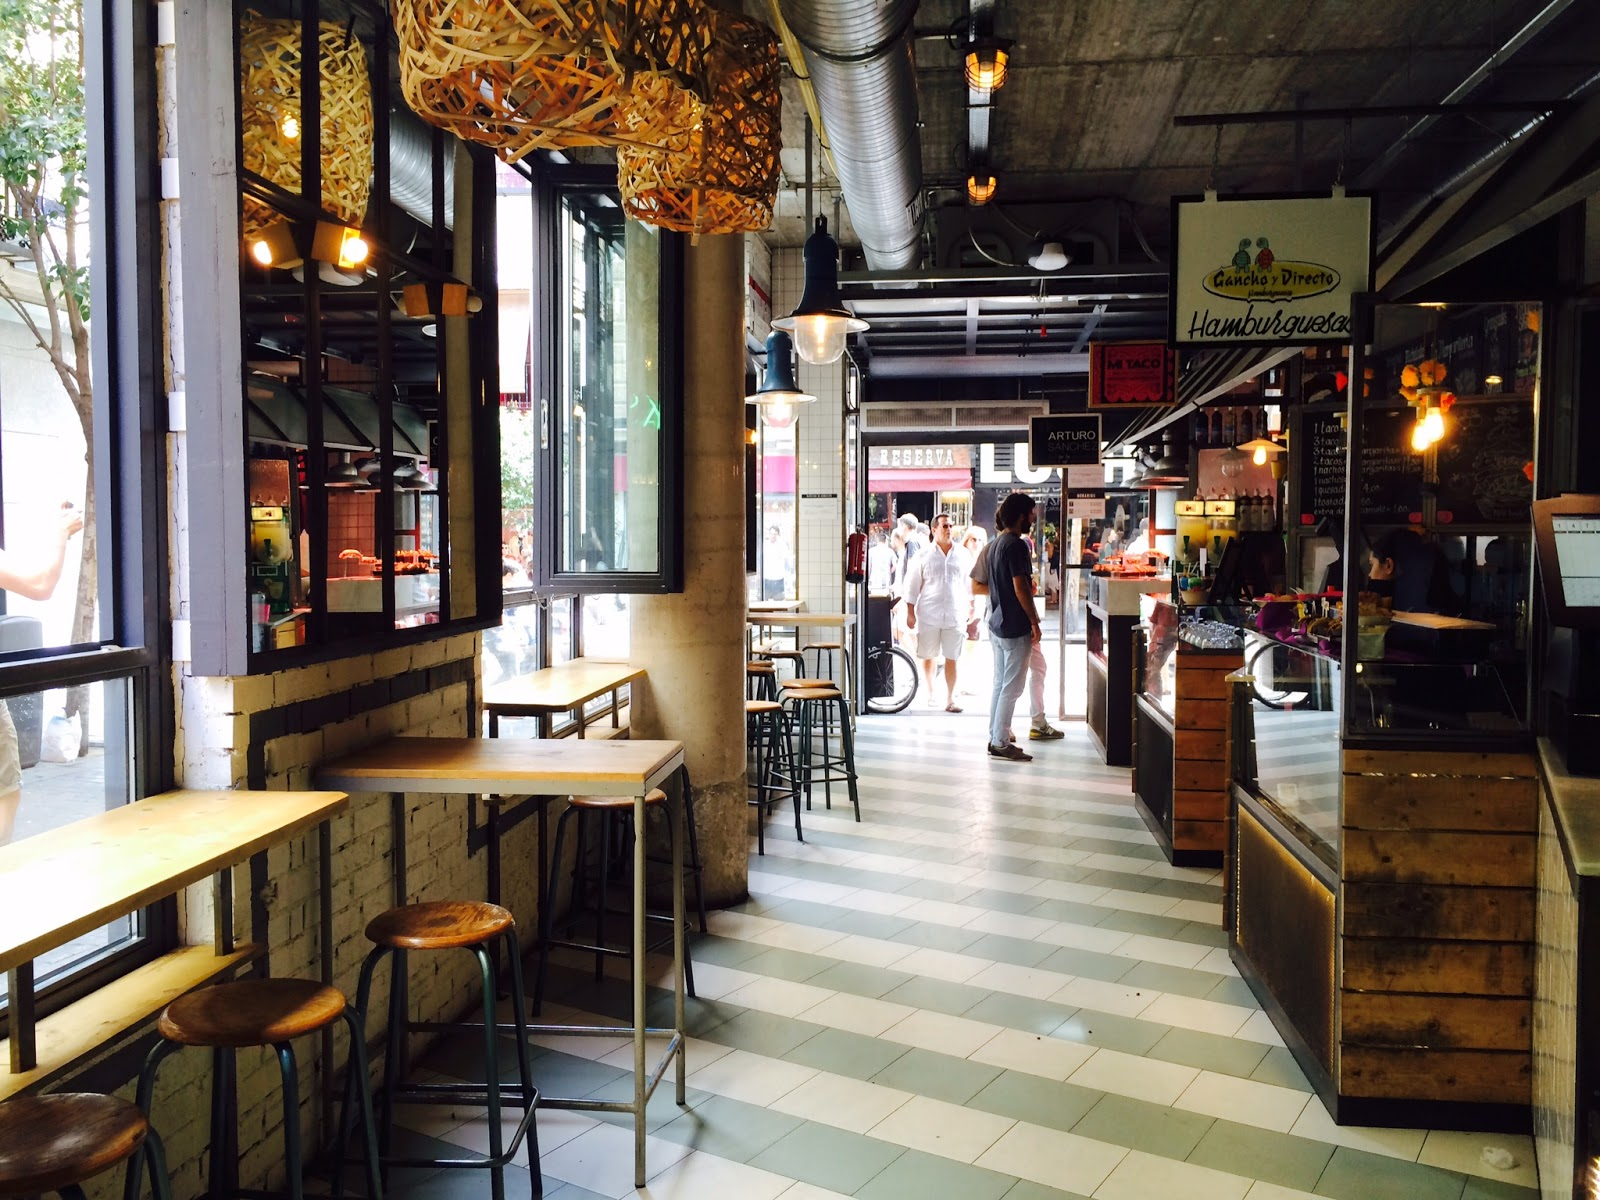 Mercado de San Ildefonso Madrid - Hotspot